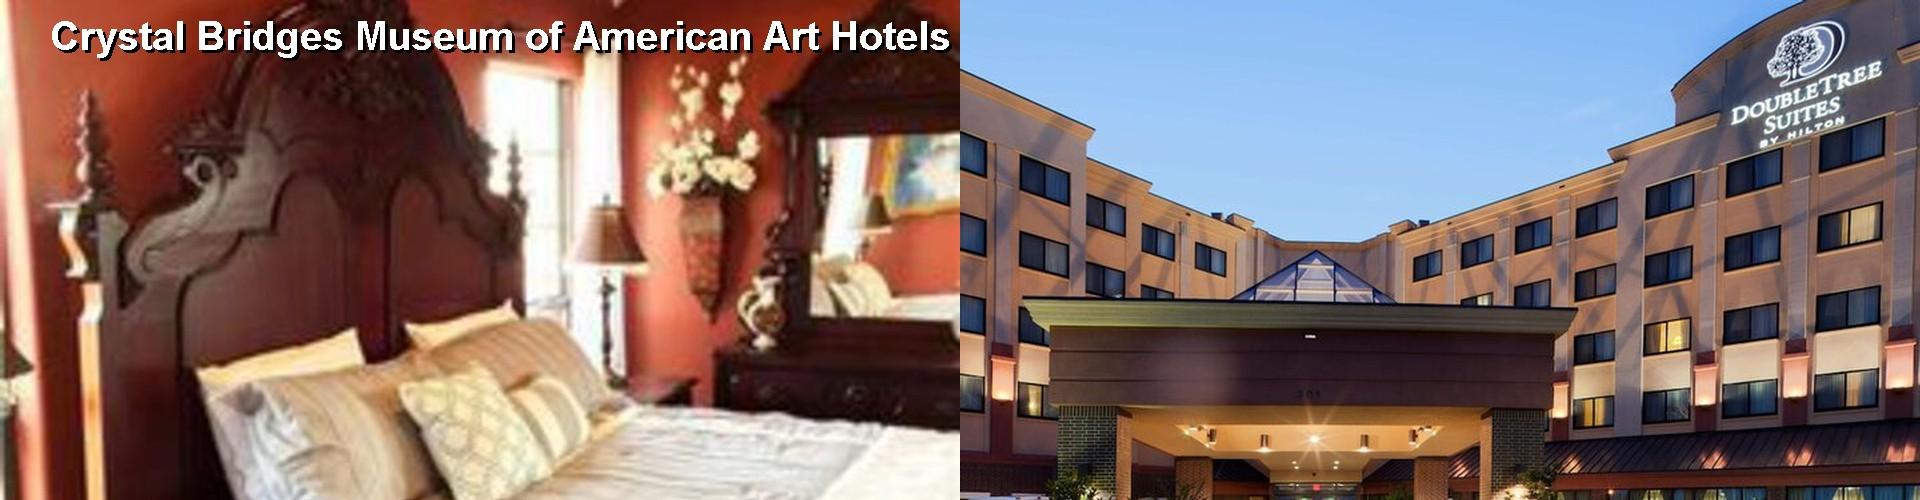 5 Best Hotels Near Crystal Bridges Museum Of American Art